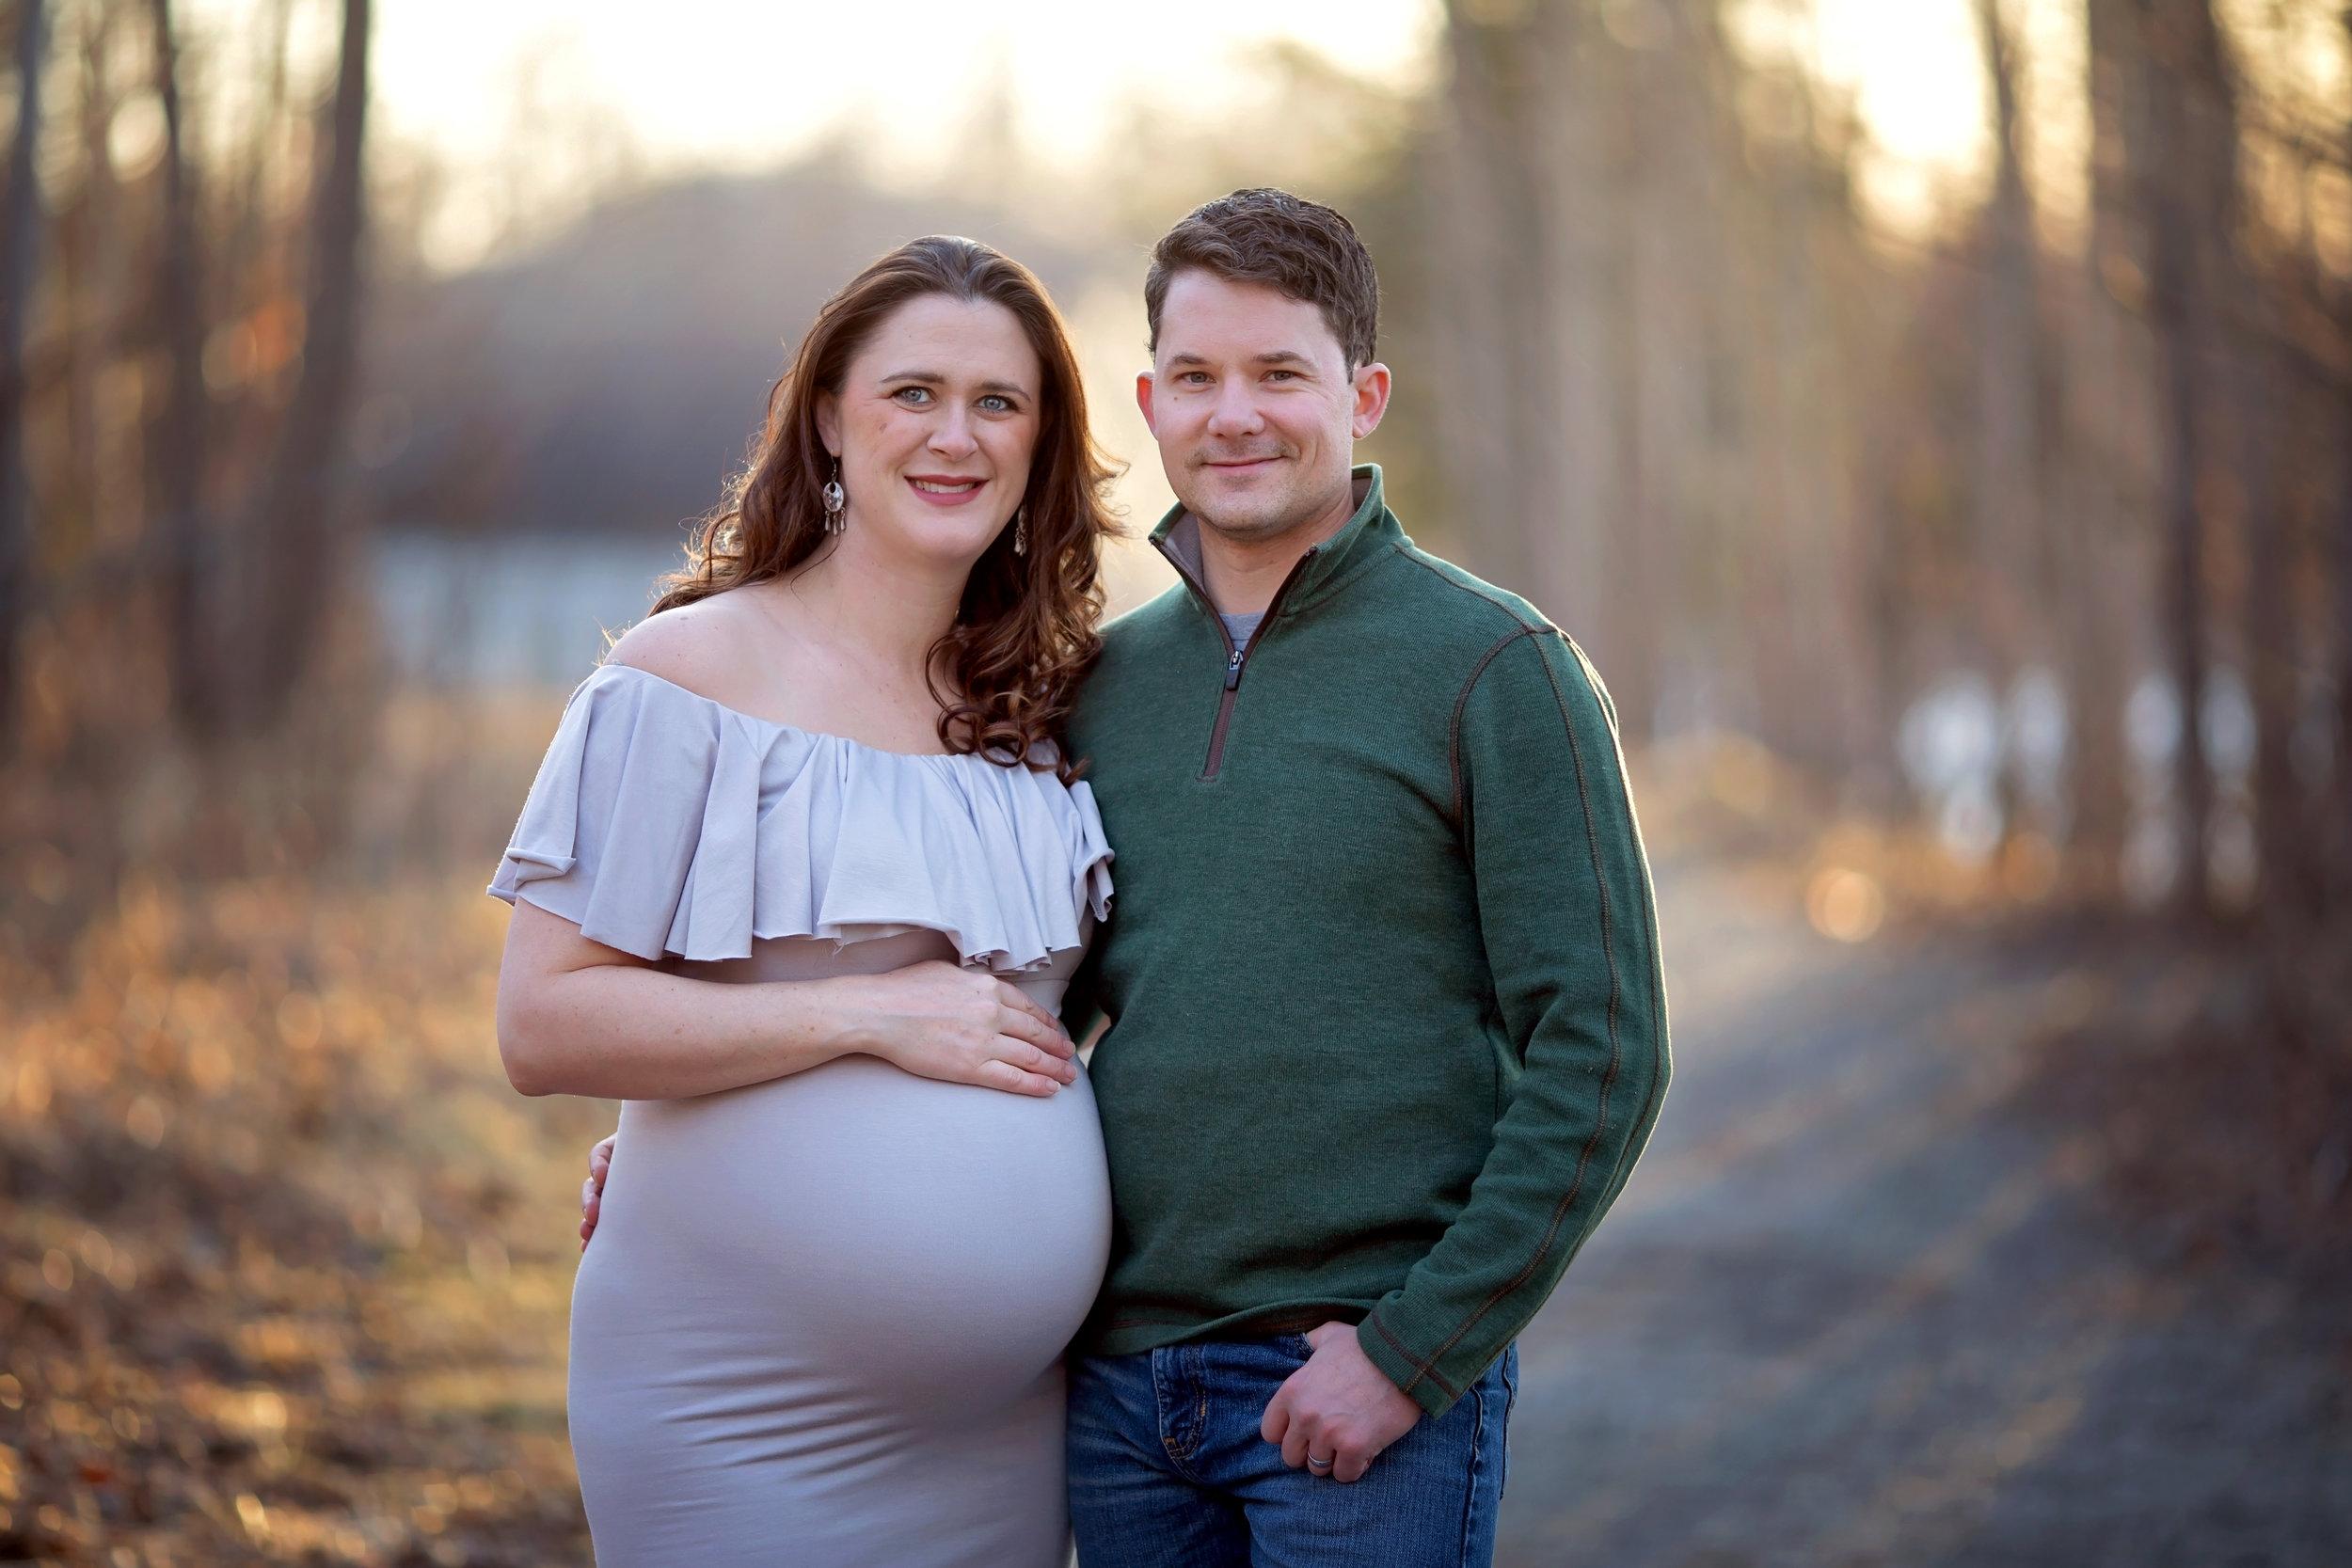 anchorage-maternity-photographer-5.jpg